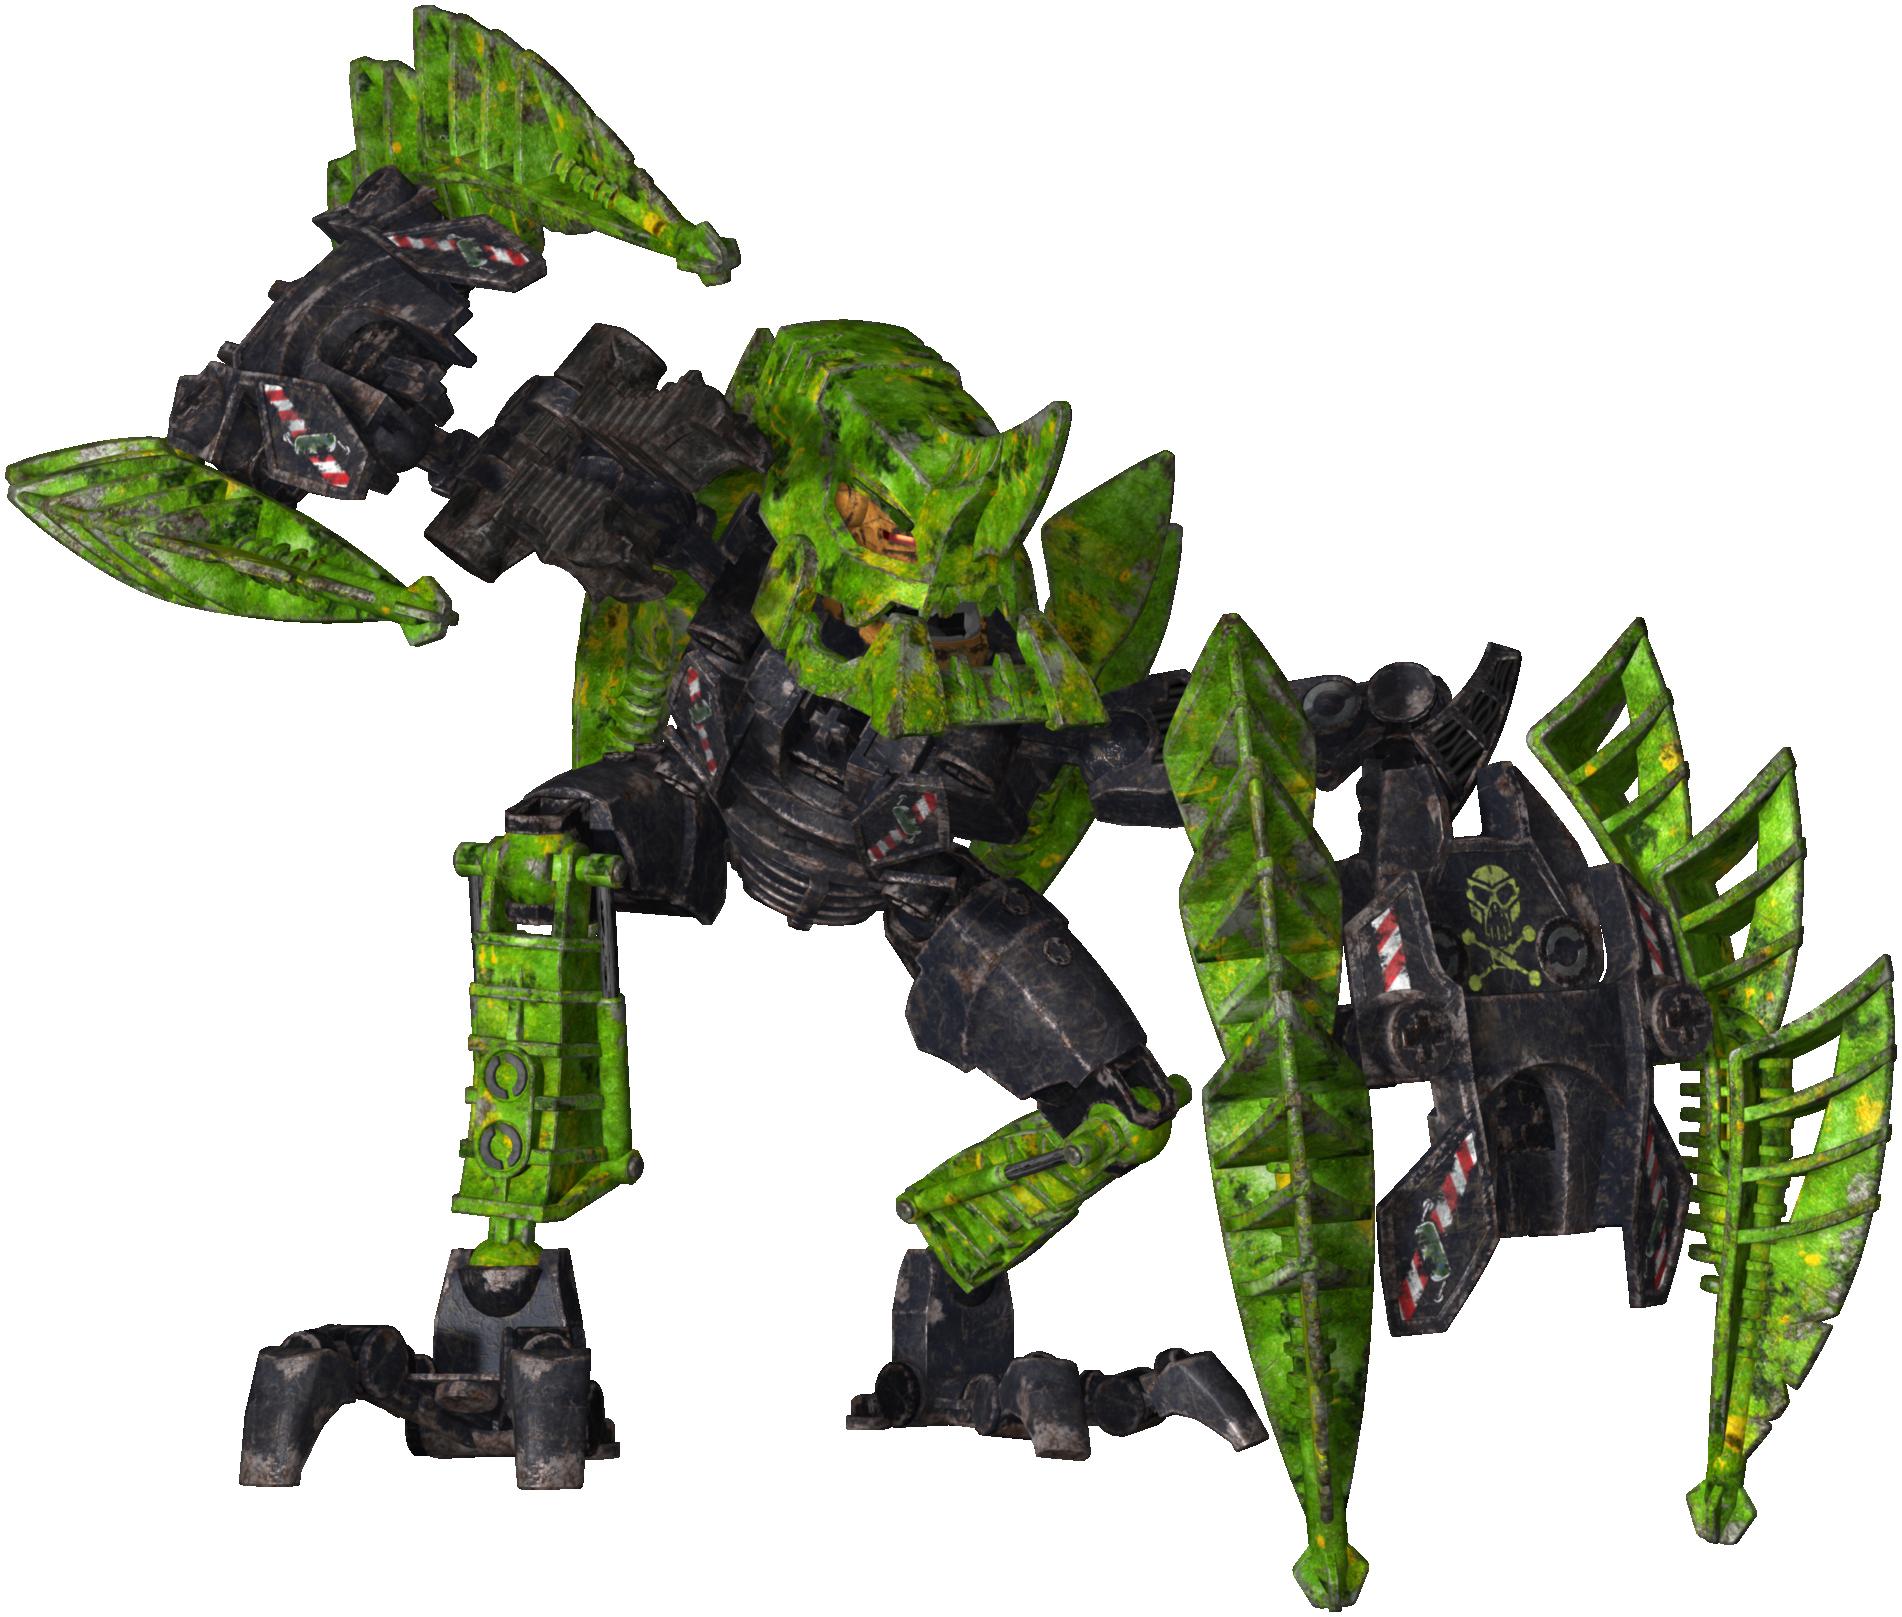 Image - Corroder (Hero Factory).jpg | Villains Wiki ...